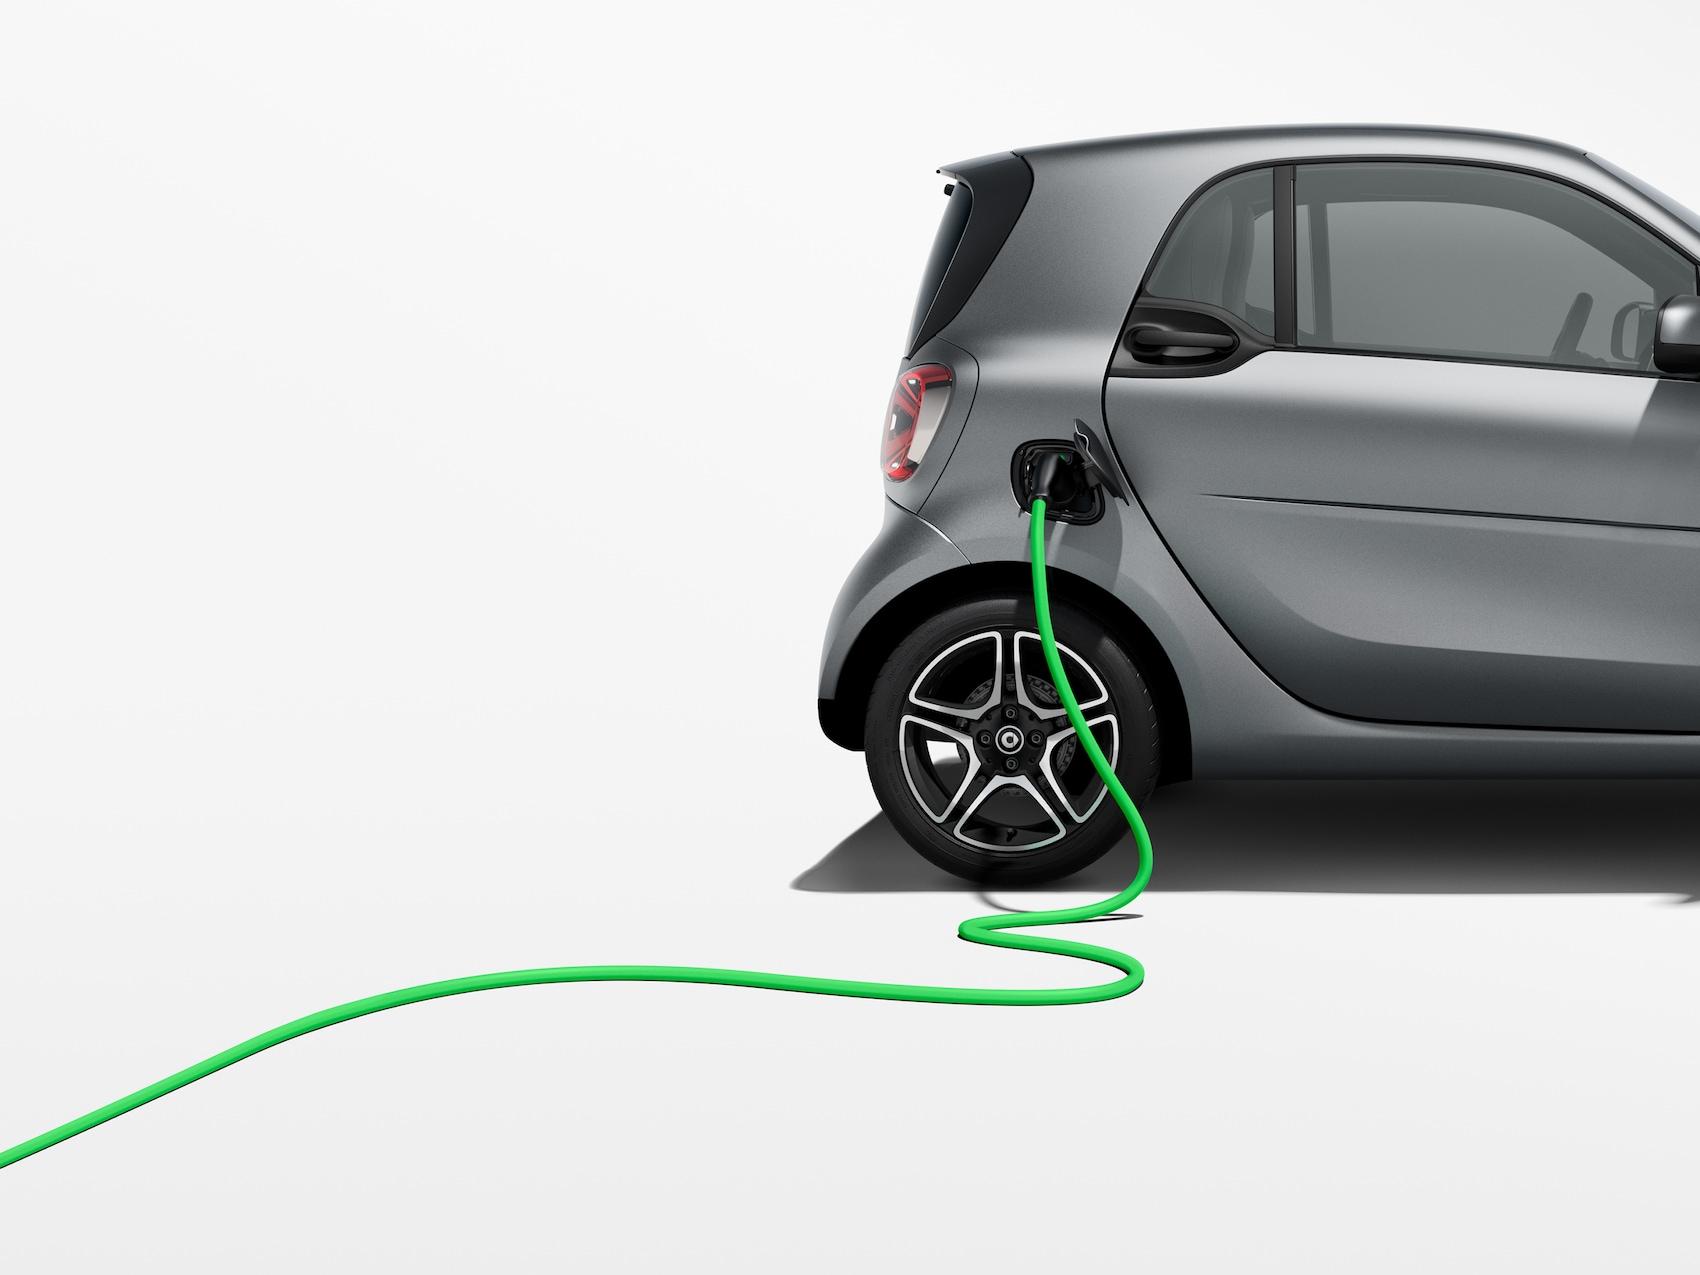 smart EQ fortwo in grau mit grünem Ladekabel